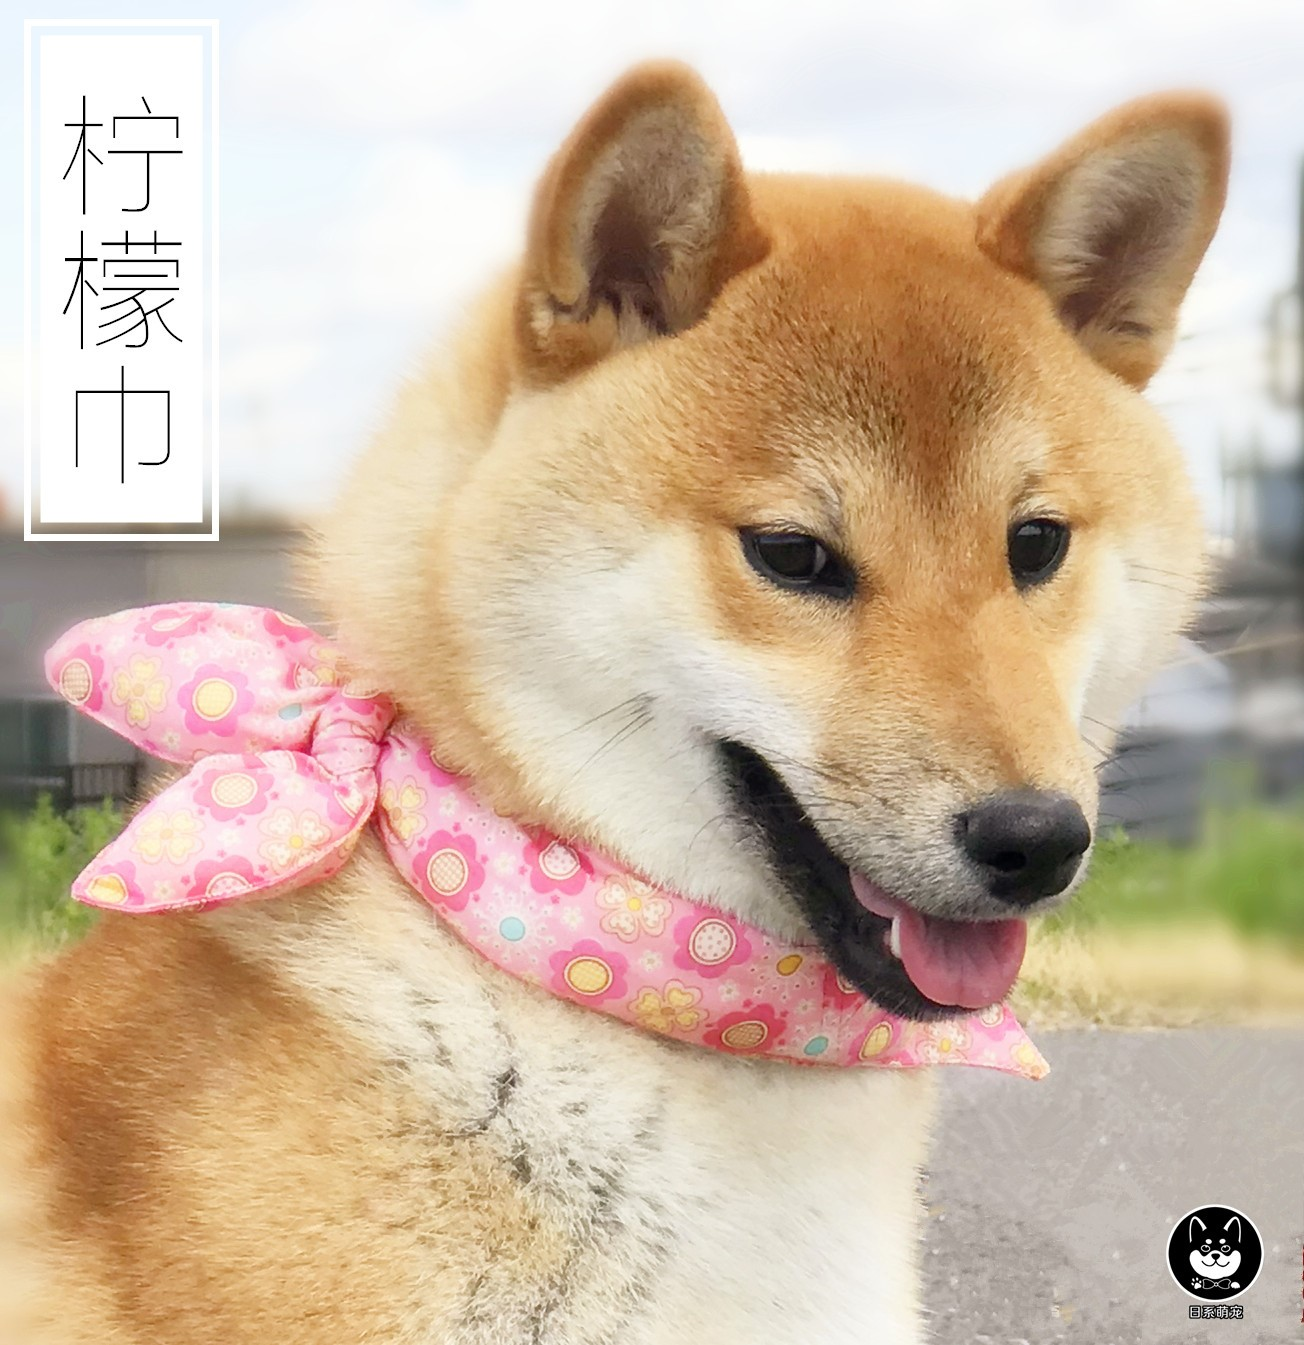 A(定制现货)唐草纹棉围巾柴犬三角巾蝴蝶结宠物猫狗狗配饰 柠檬巾